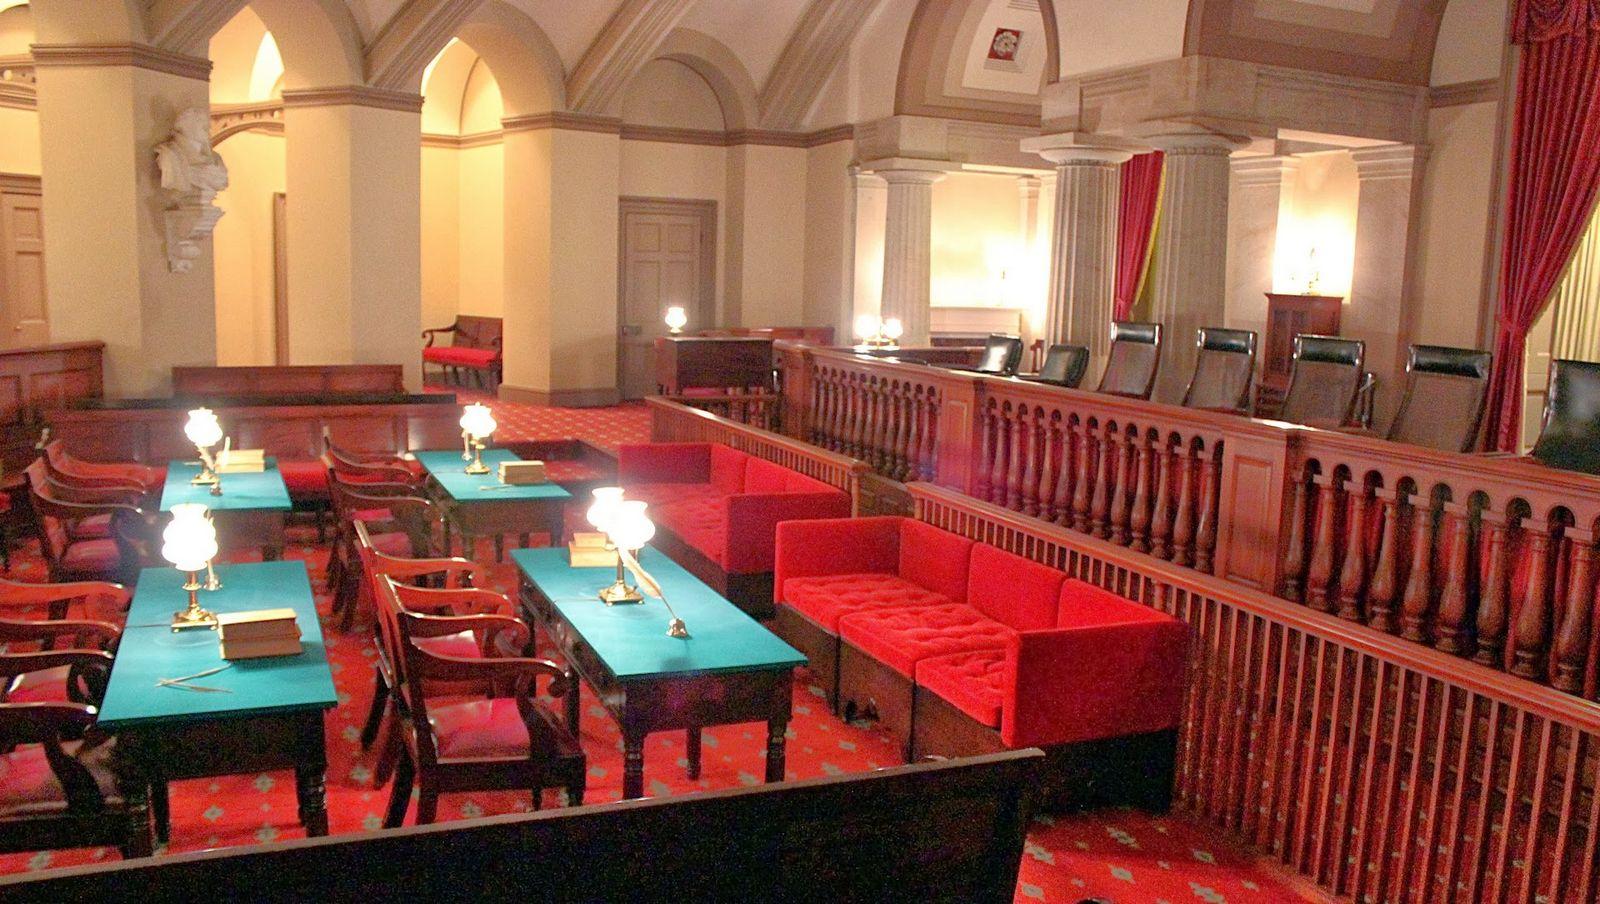 La vieja cámara del Tribunal Supremo